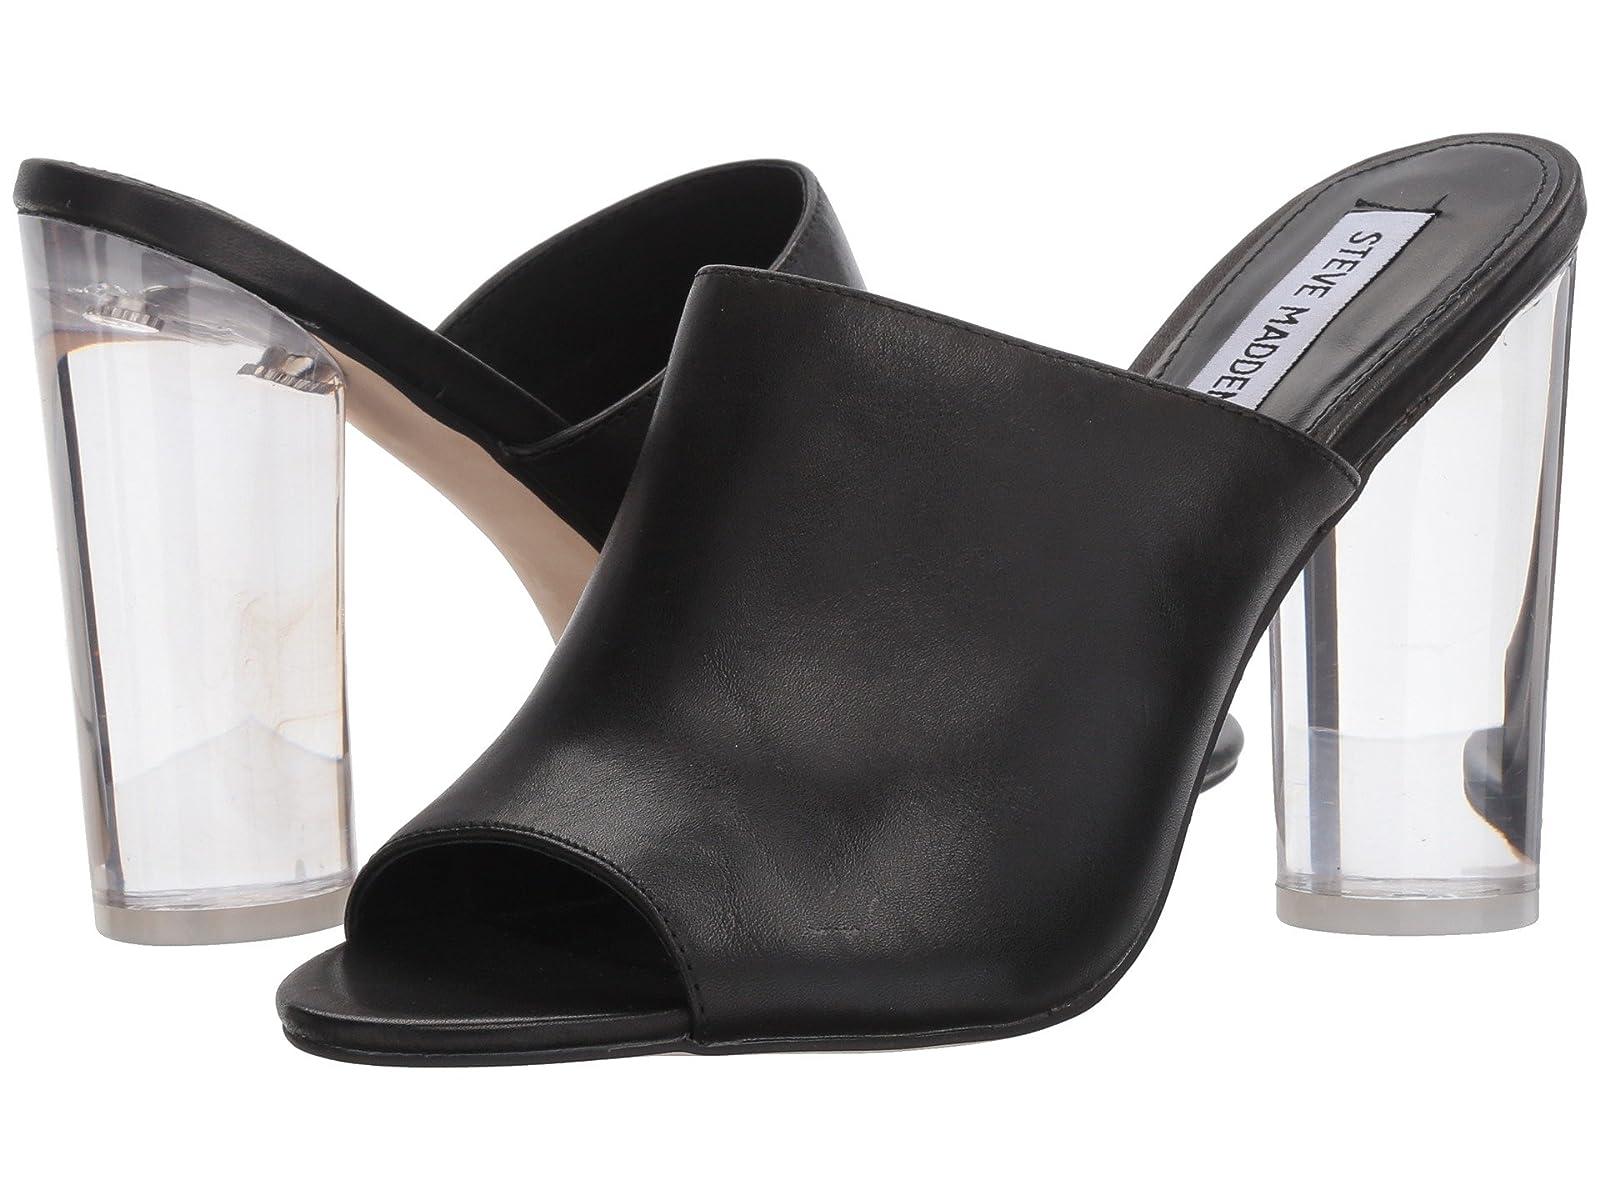 Steve Madden ClassicsCheap and distinctive eye-catching shoes